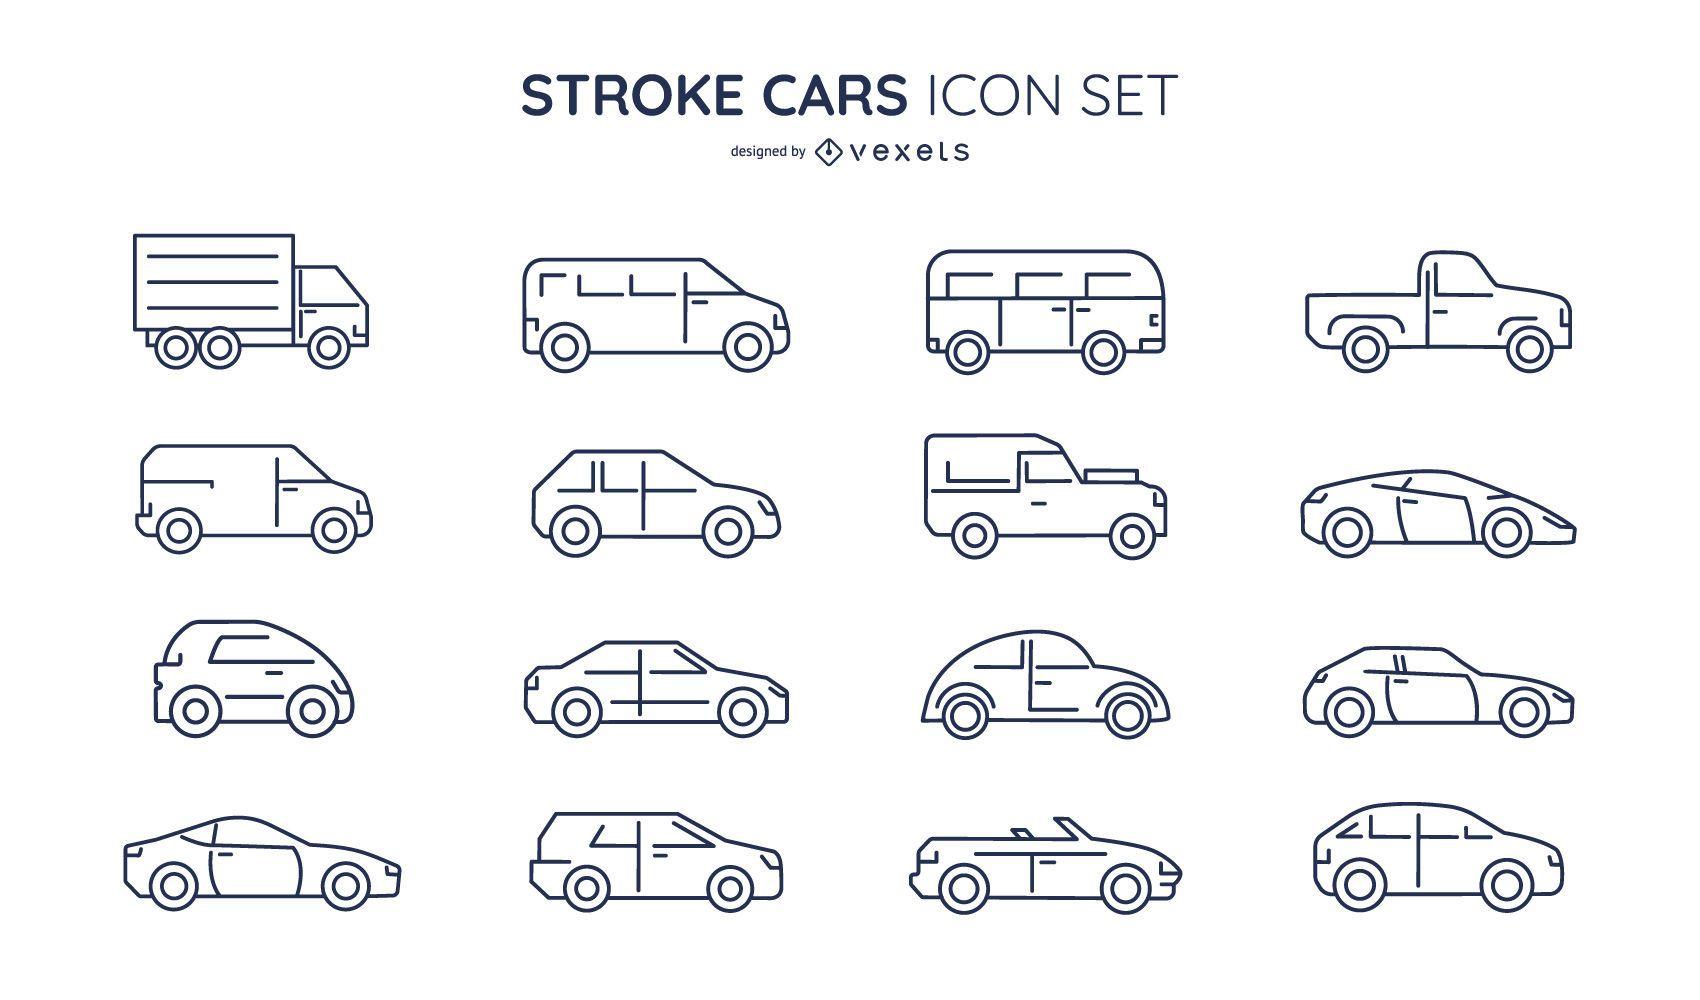 Stroke cars icon set